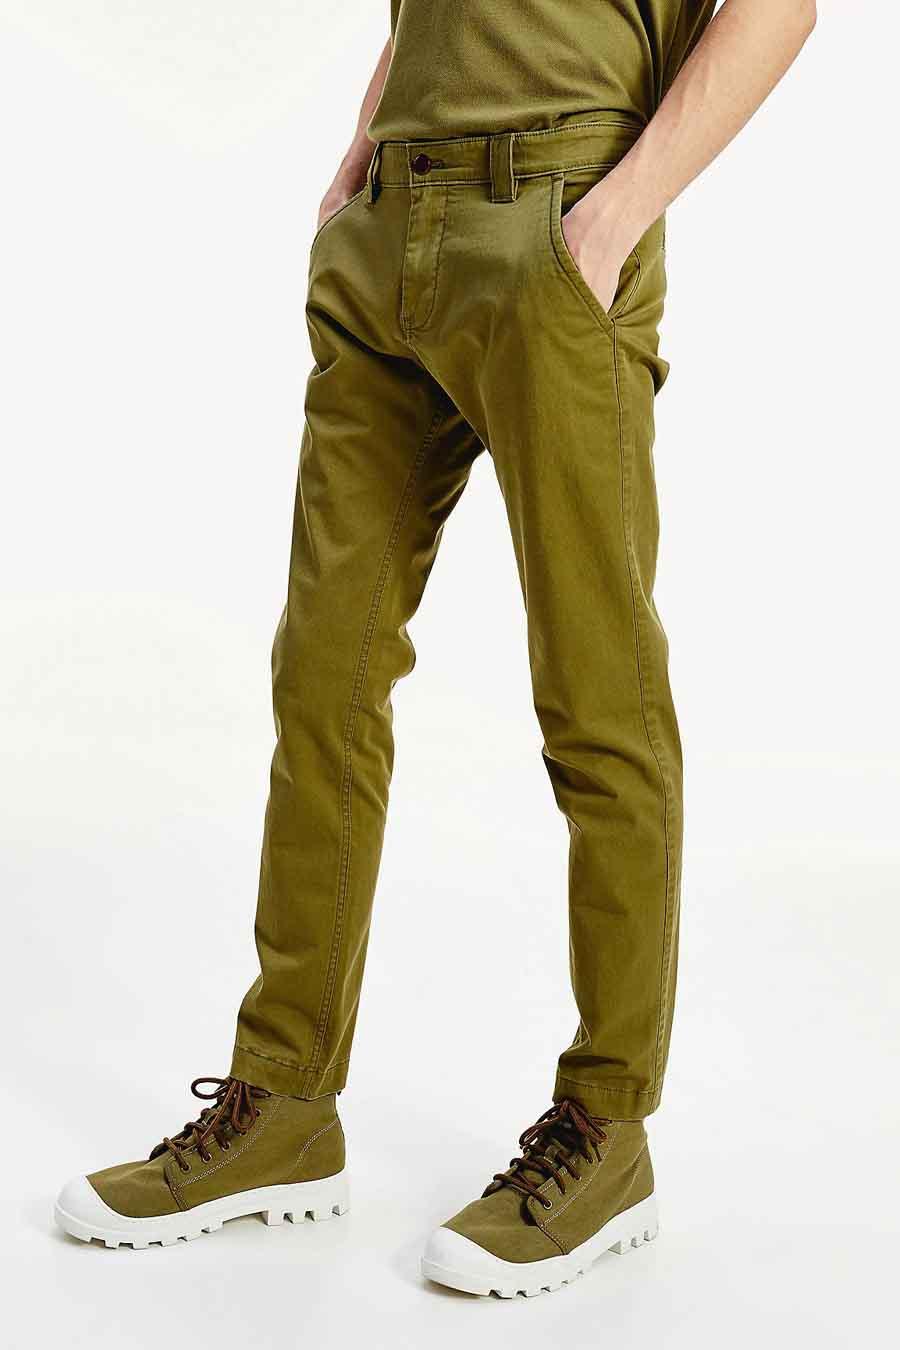 Tommy Jeans Chino, Groen, Heren, Maat: 28x32/30x32/31x32